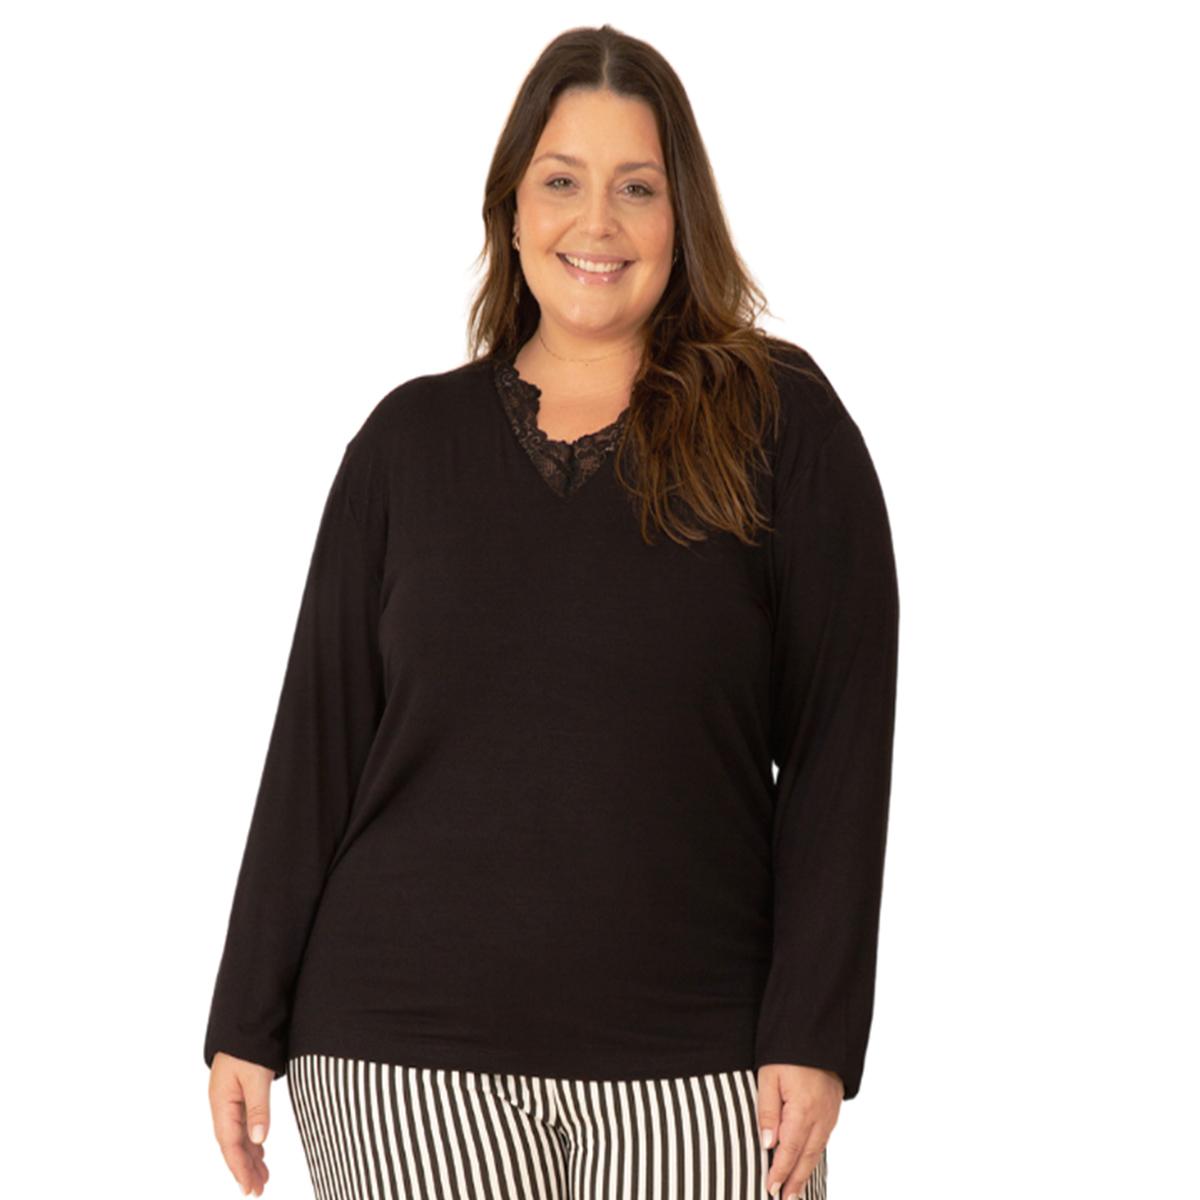 Pijama feminino plus size viscolycra detalhe renda preto